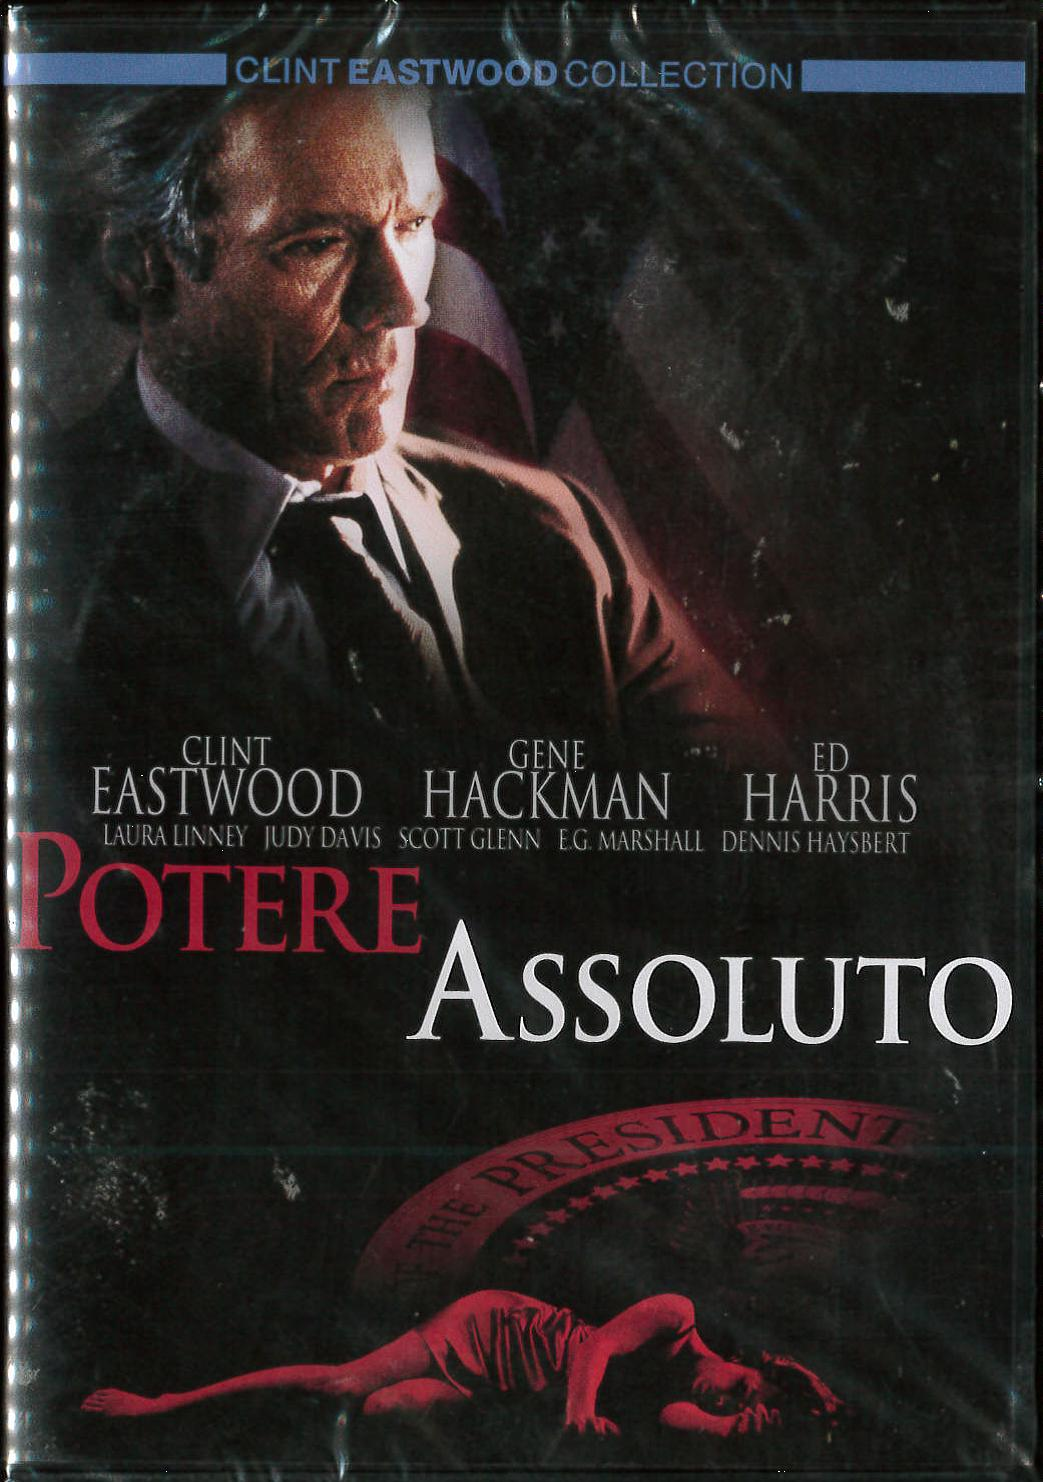 POTERE ASSOLUTO (DVD)